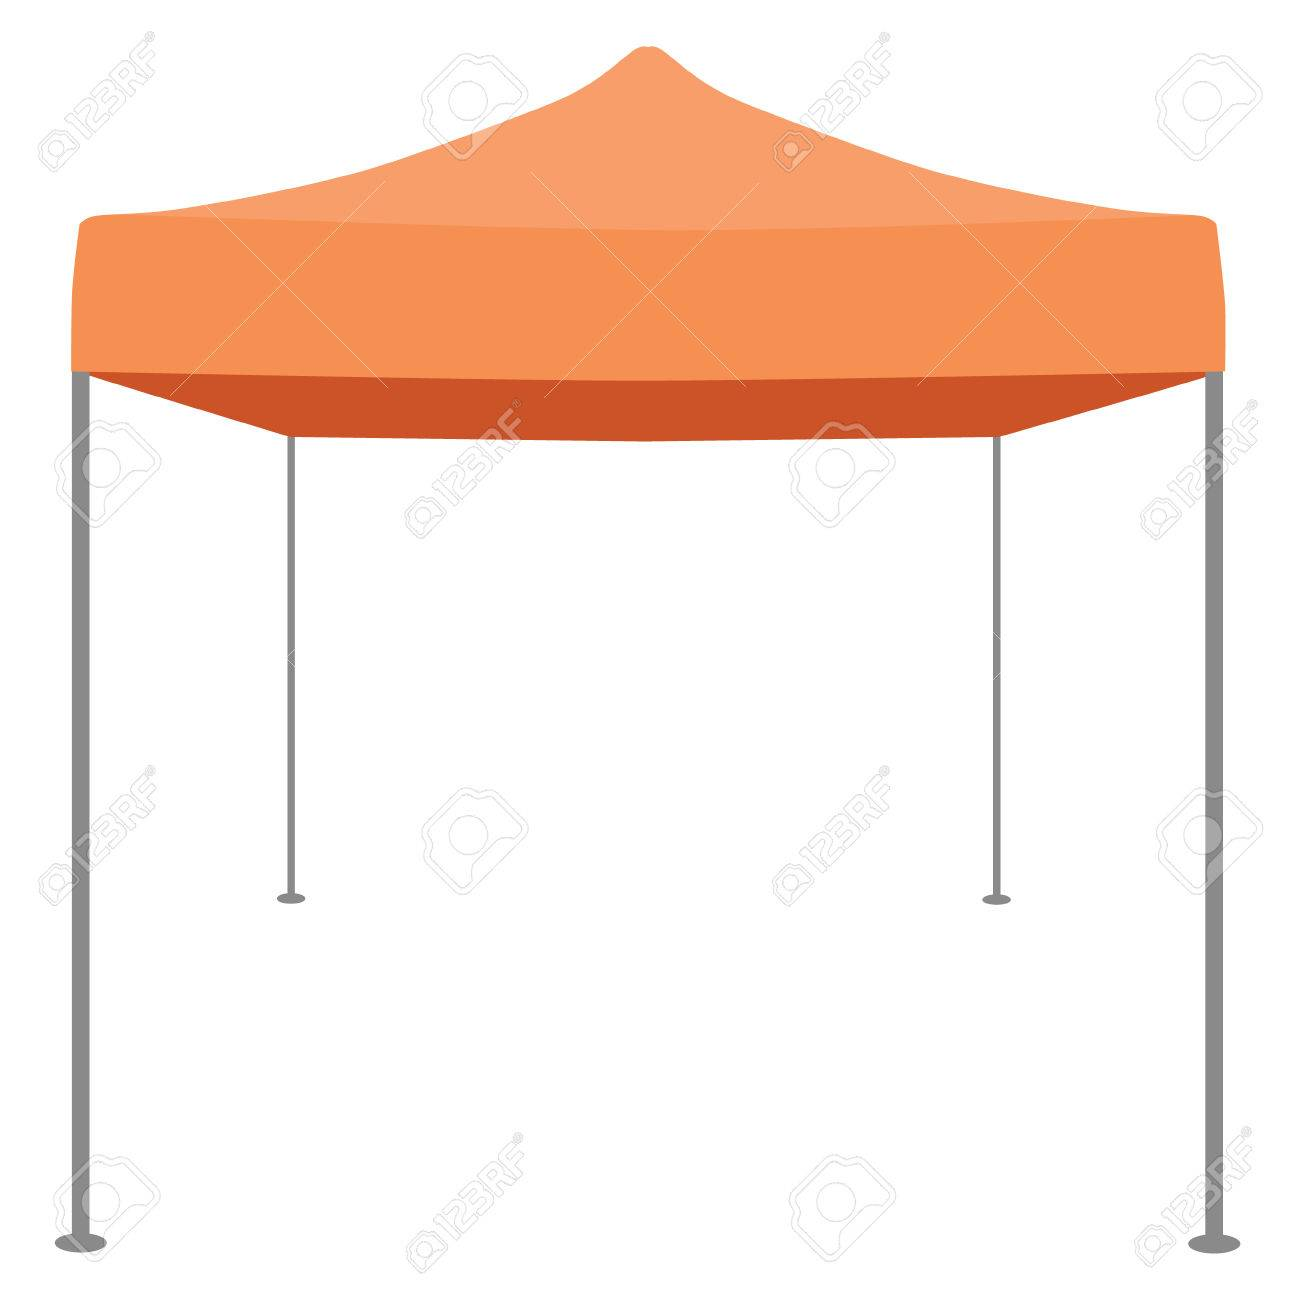 Orange folding tent vector illustration. Pop up gazebo. Canopy tent Stock Vector - 45912567  sc 1 st  123RF.com & Orange Folding Tent Vector Illustration. Pop Up Gazebo. Canopy ...